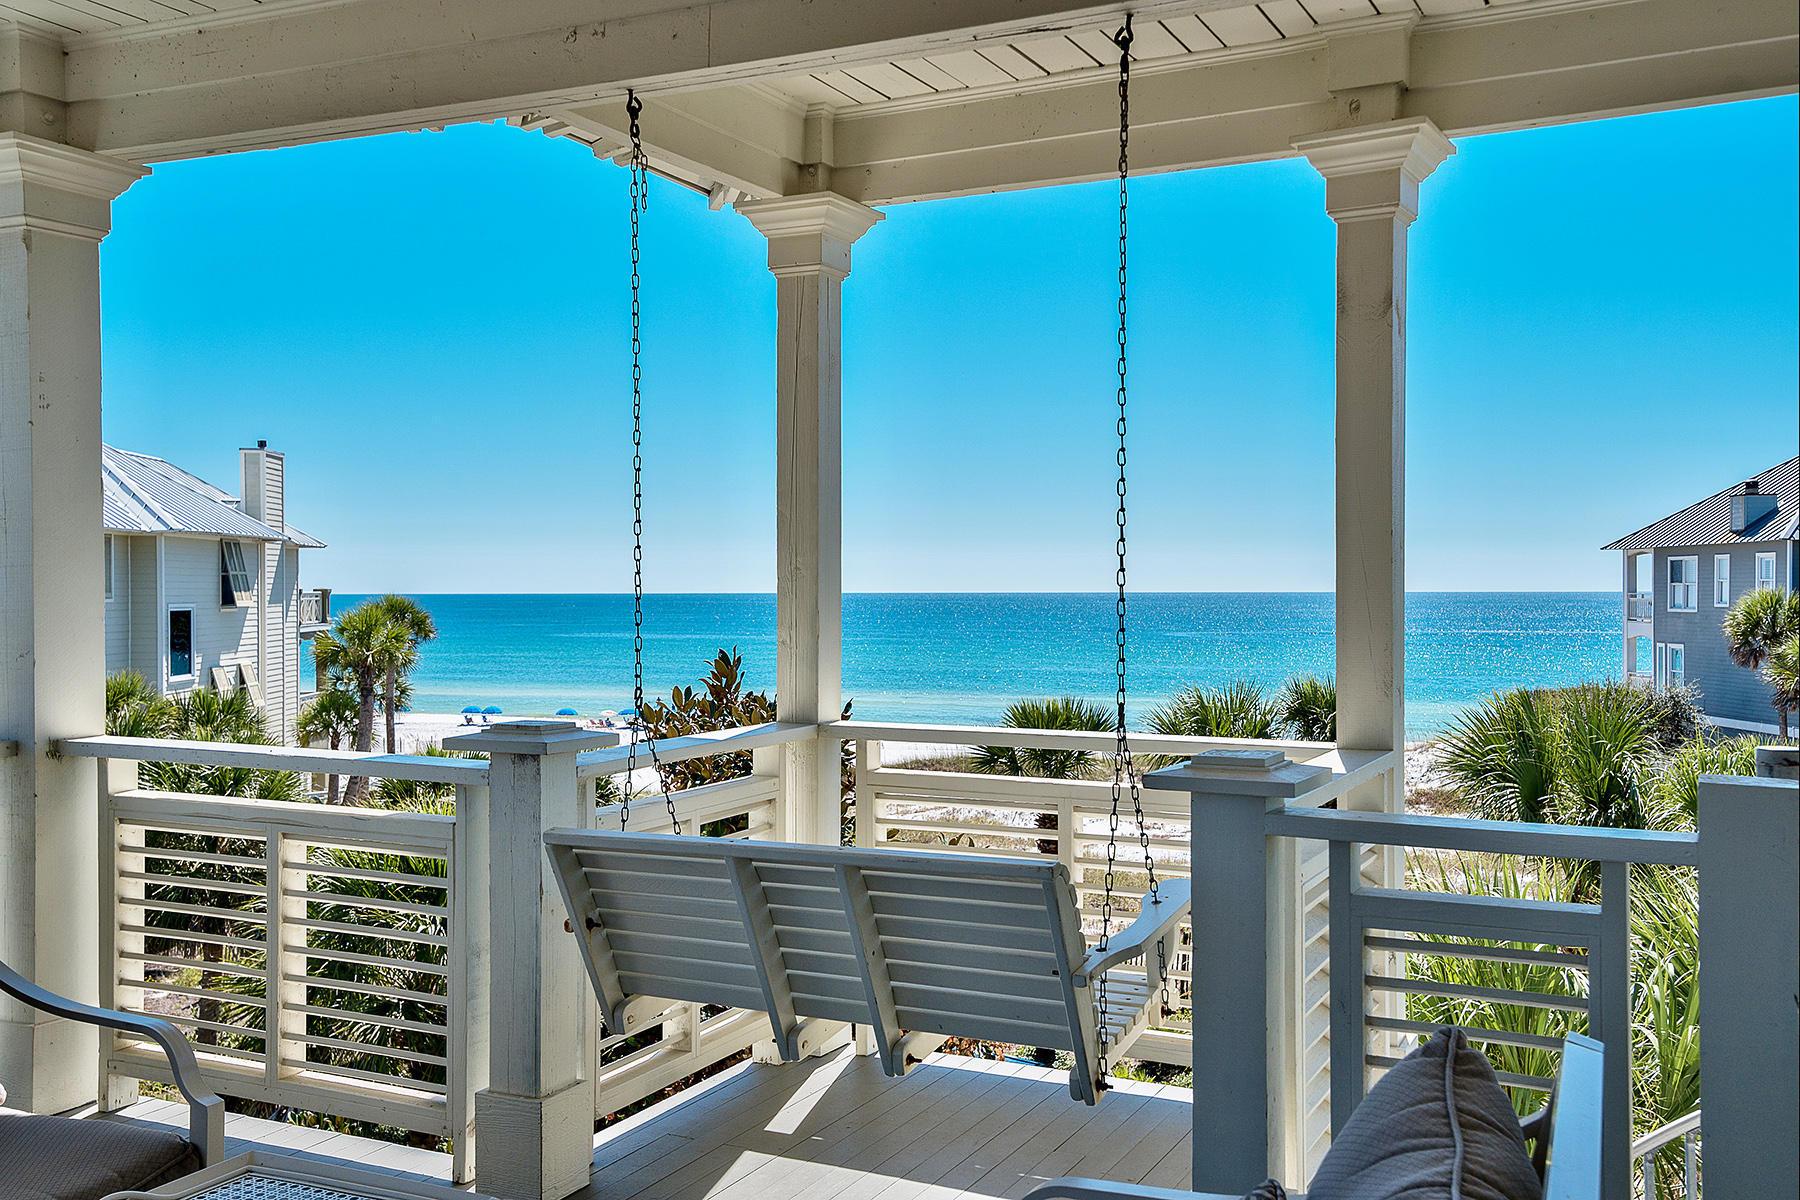 Vivienda unifamiliar por un Venta en LUXURY RATED RESIDENCE WITH GULF VIEWS 410 Beachfront Trail Santa Rosa Beach, Florida, 32459 Estados Unidos